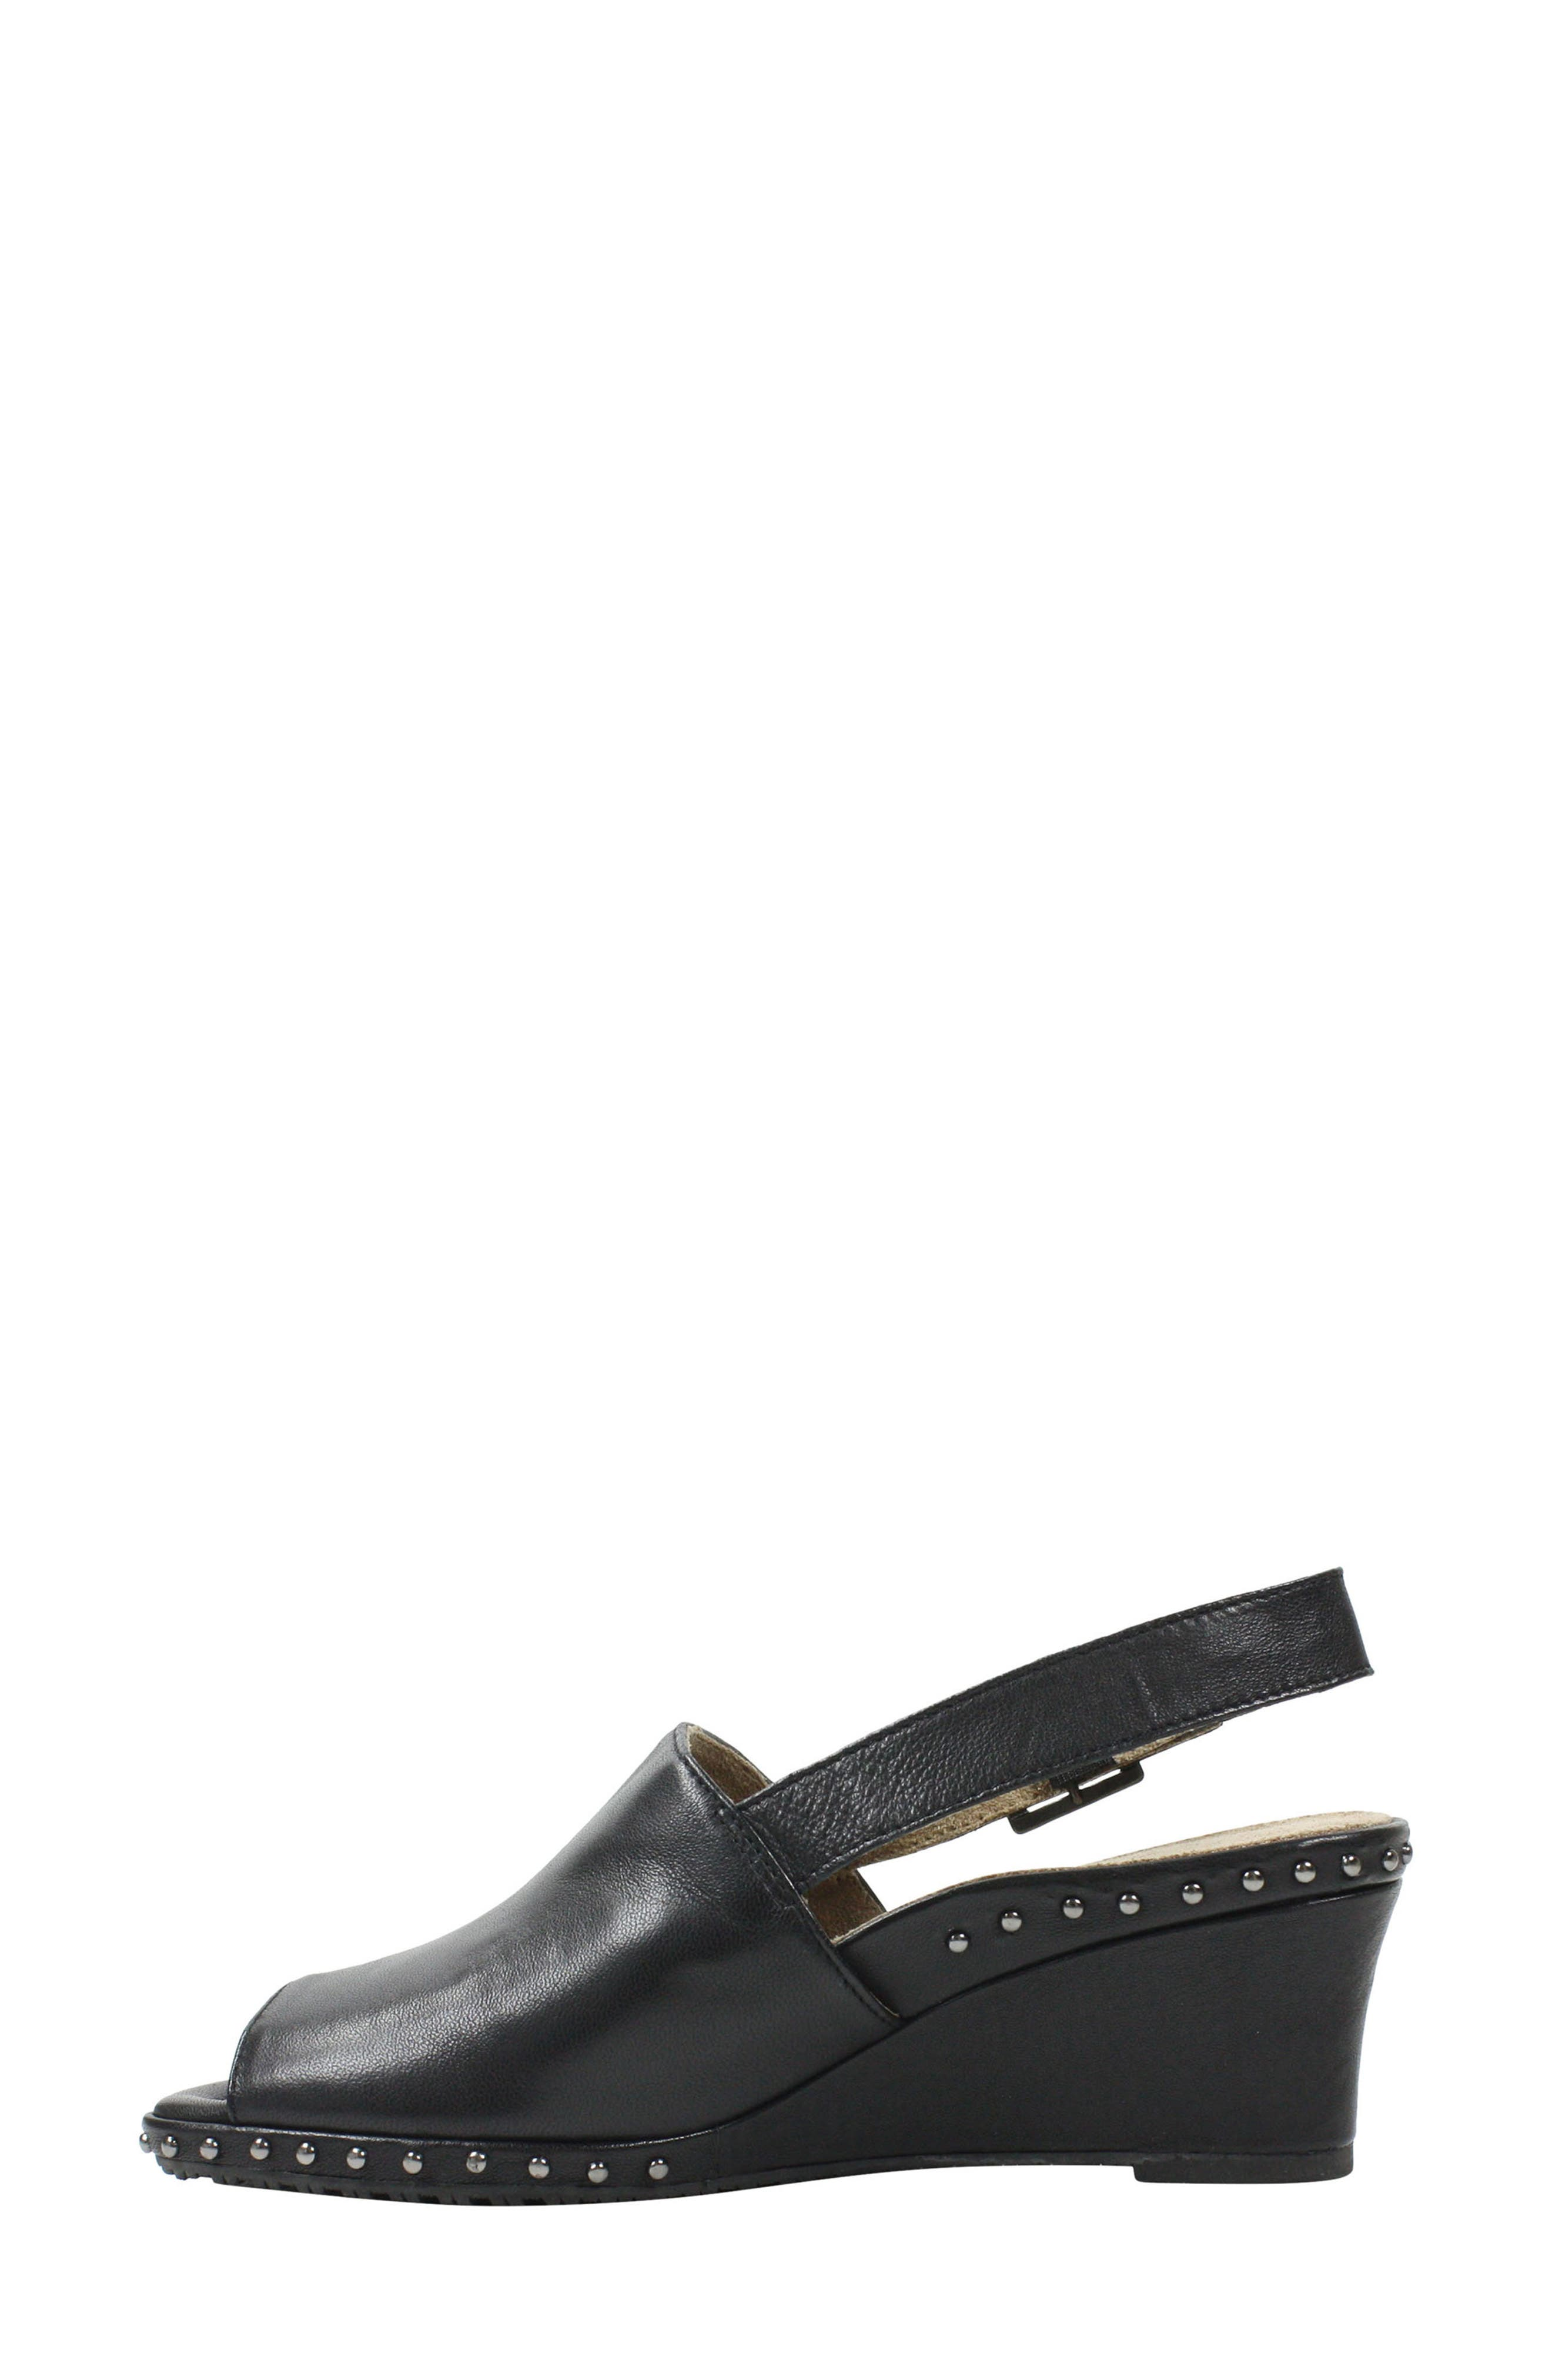 Antandra Wedge Sandal,                             Alternate thumbnail 7, color,                             BLACK LEATHER